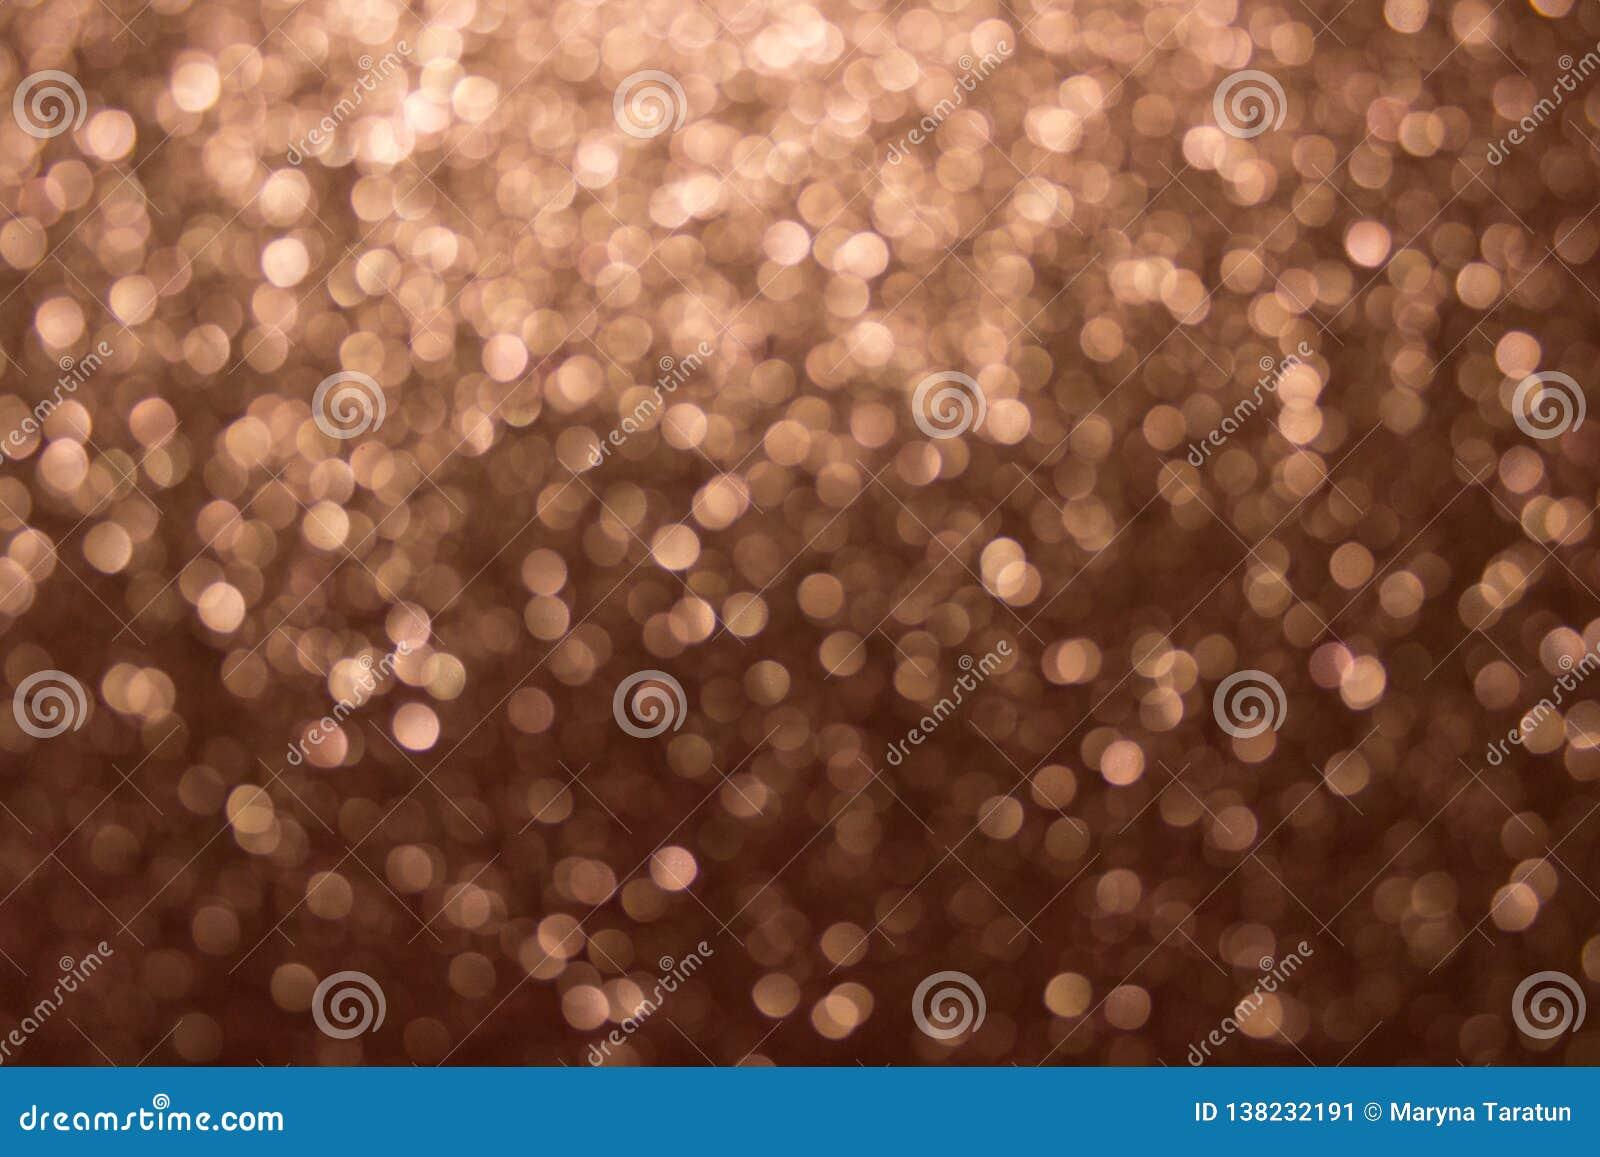 Bokeh del oro, fondo abstracto creado por las luces de neón